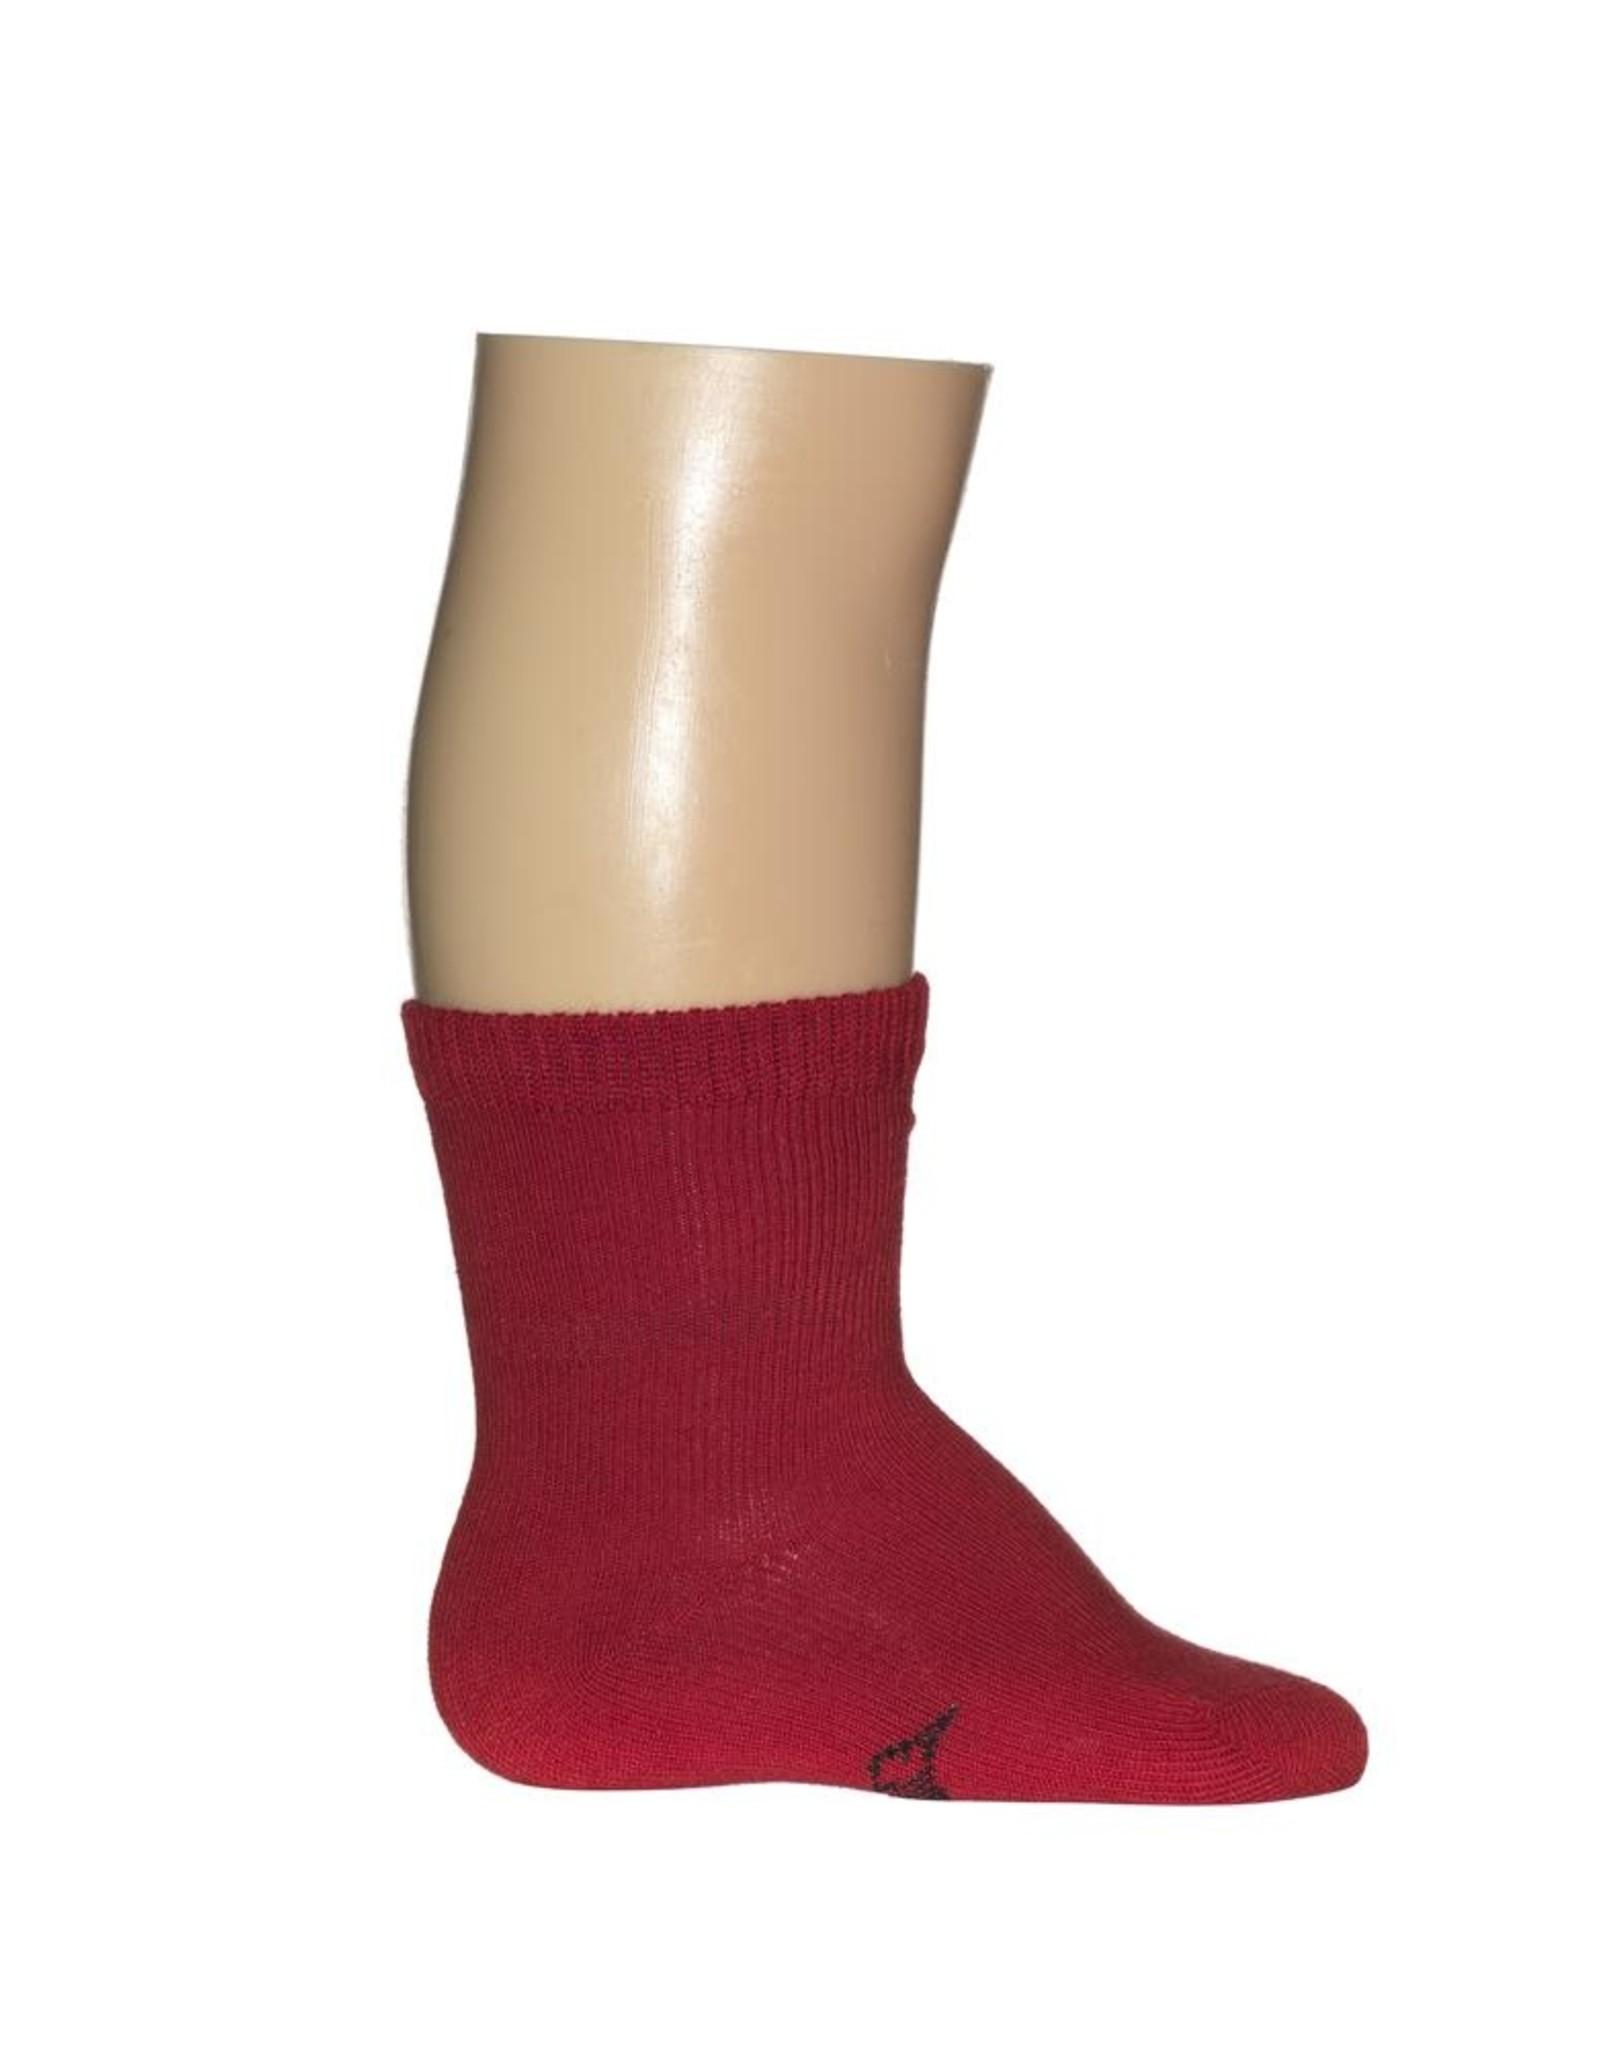 Bonnie Doon Cotton sock Strawberry